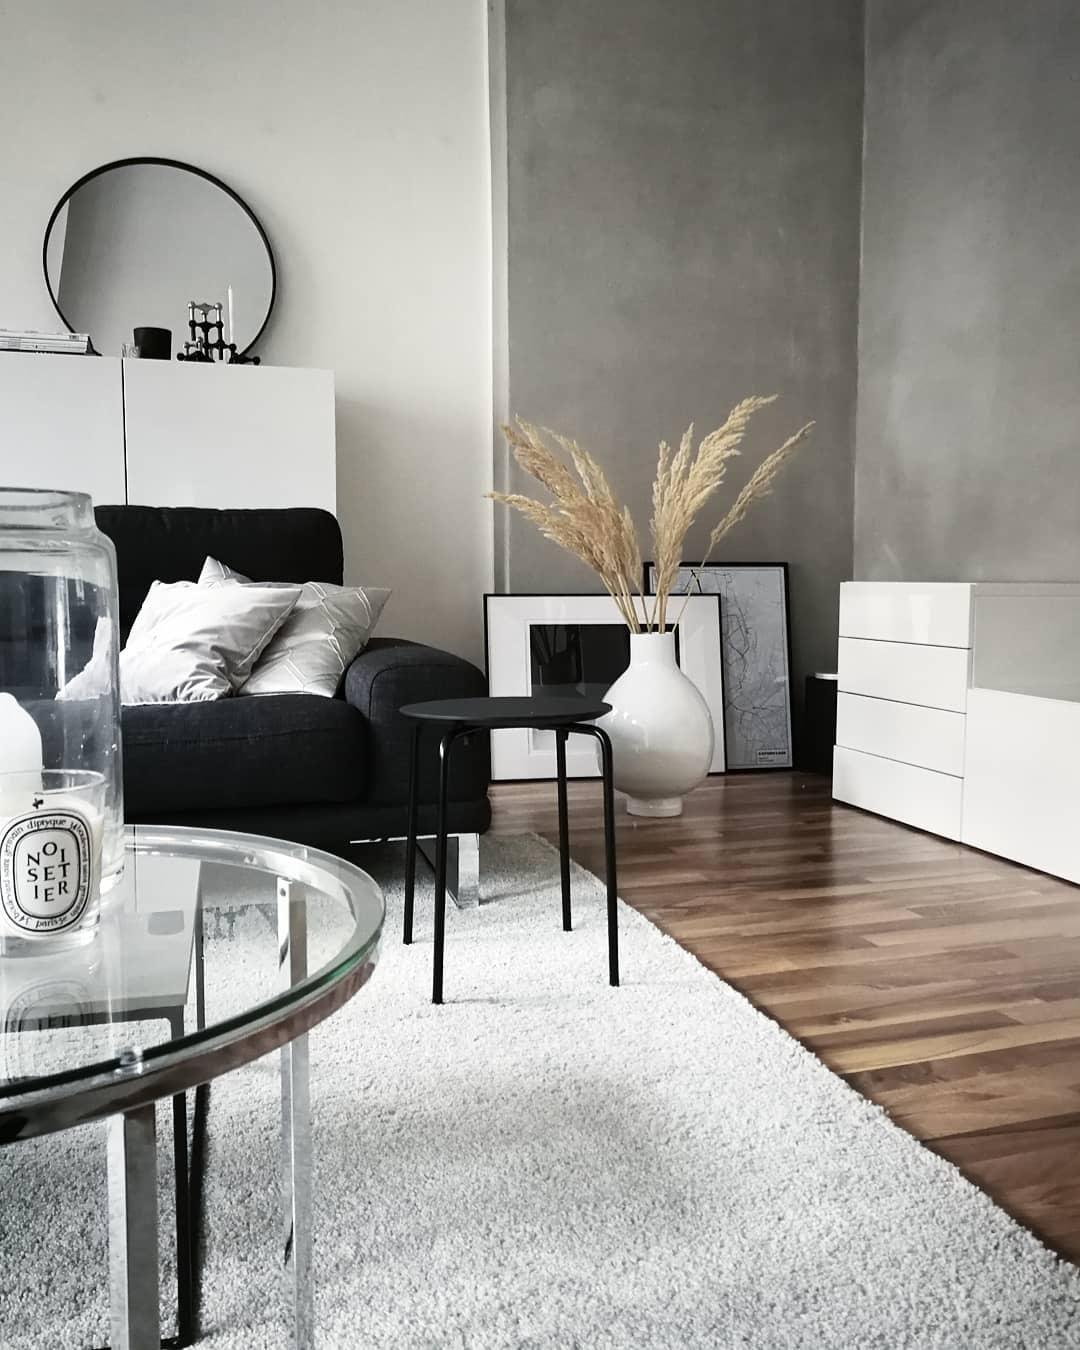 Küchenraumteiler • Bilder & Ideen • COUCH